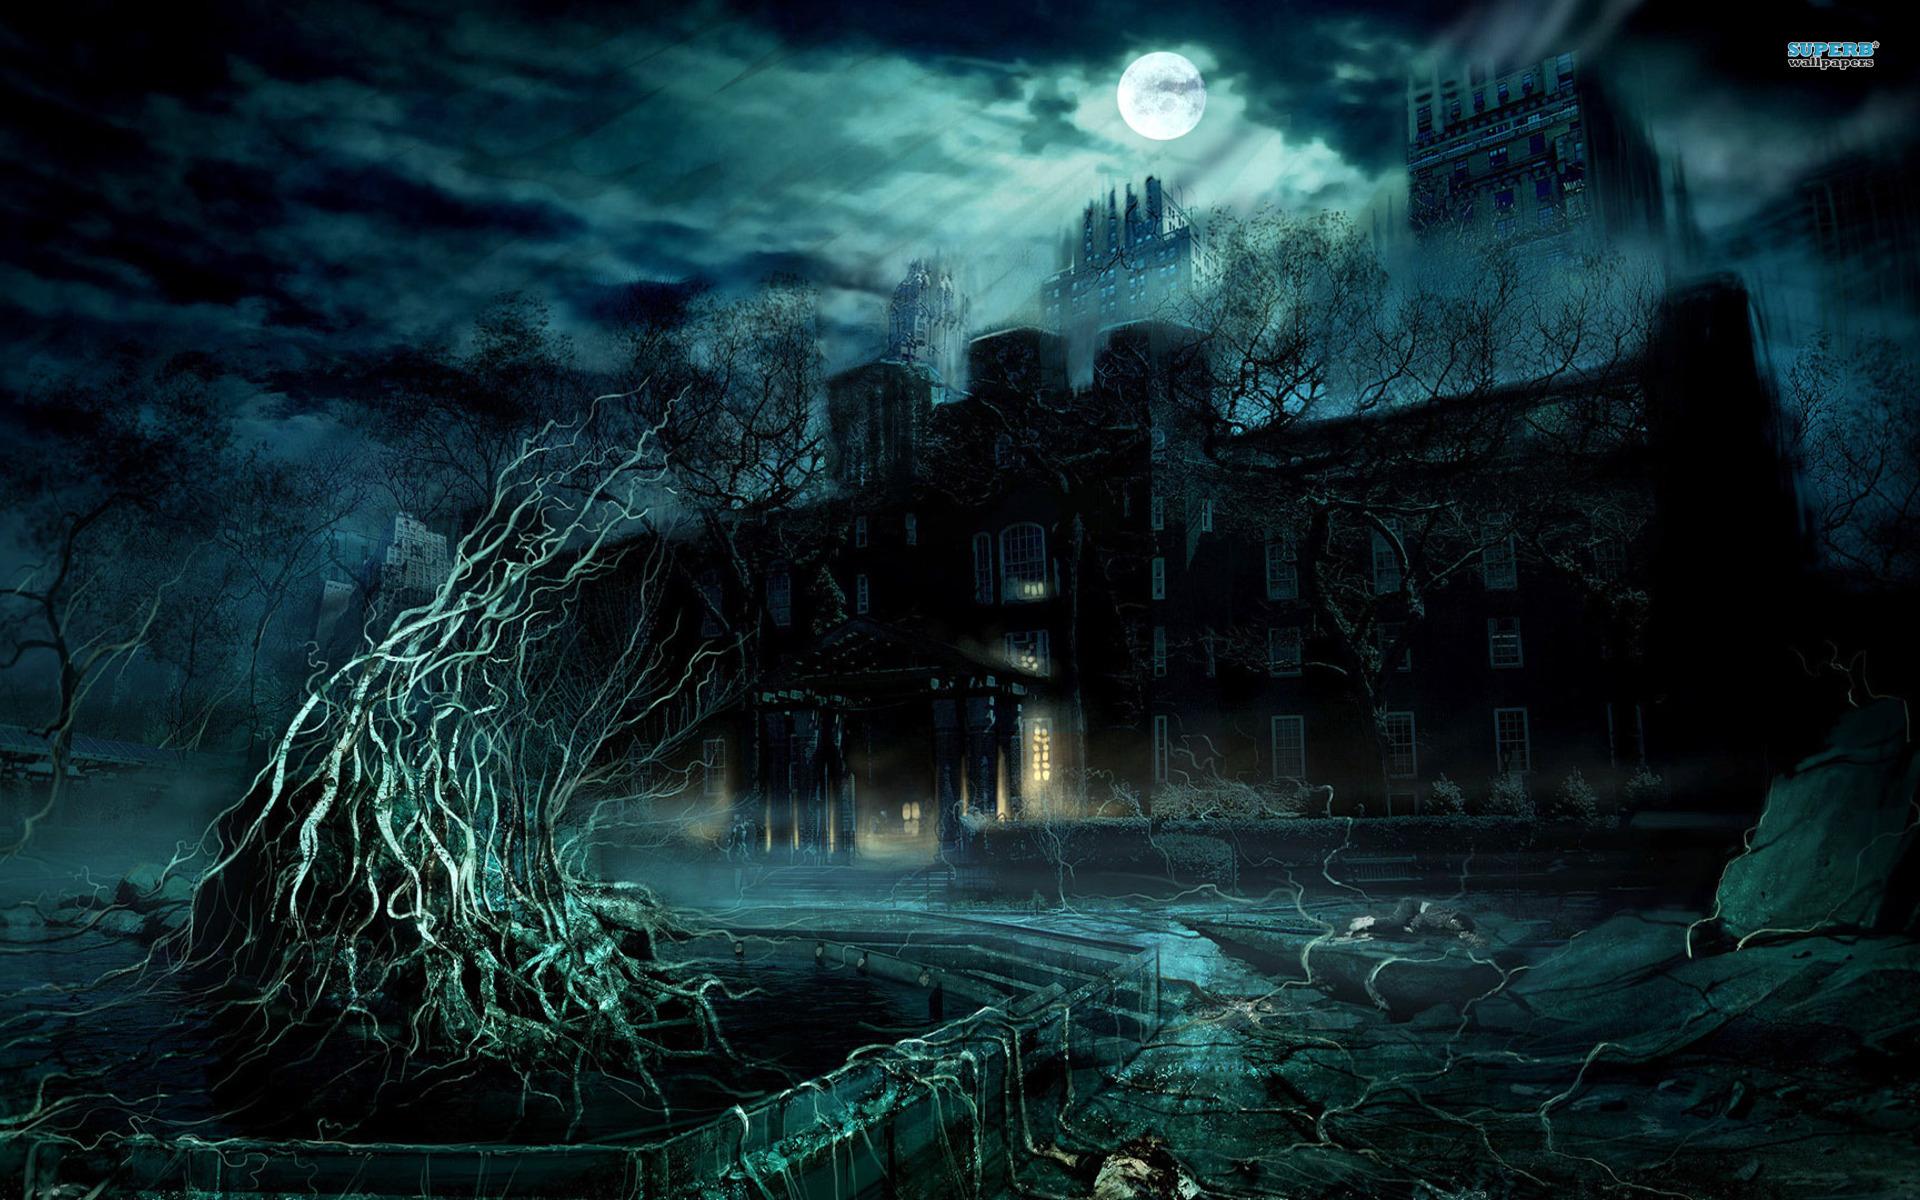 Best Wallpaper Halloween Haunted - Holidays___Halloween_halloween_haunted_mansion_046092_  Photograph_573121.jpg